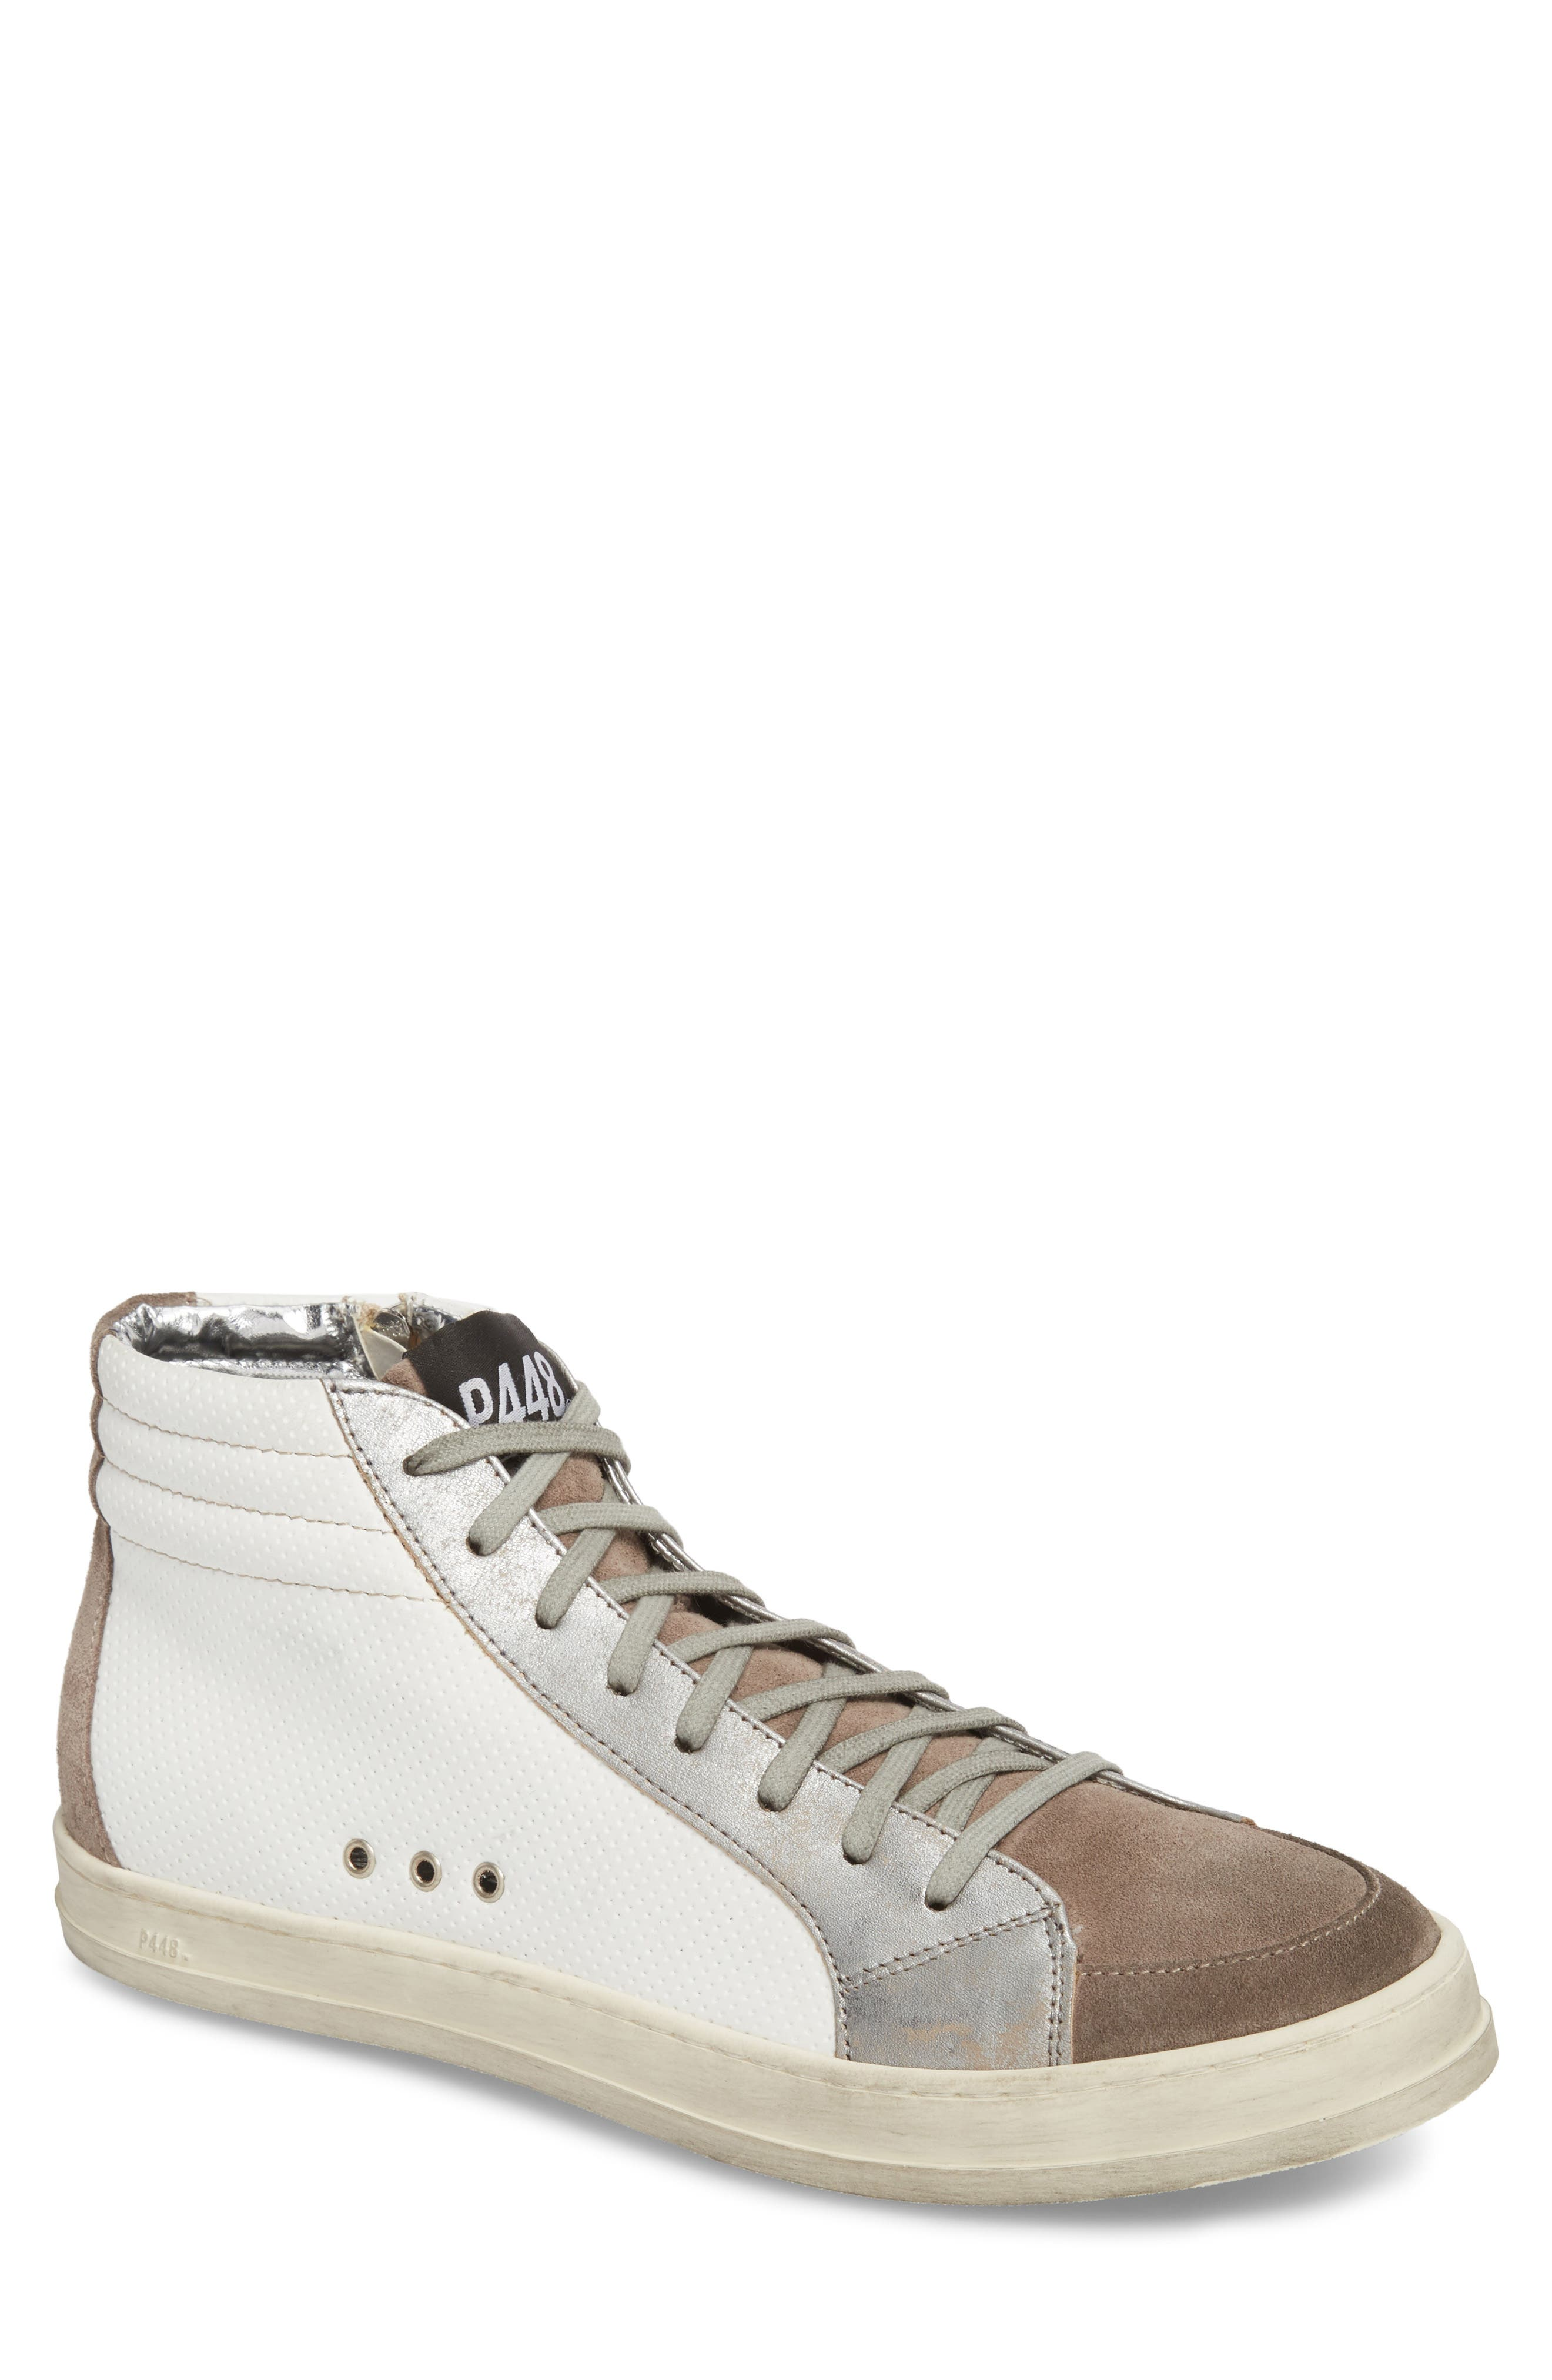 Skate High Top Sneaker,                             Main thumbnail 1, color,                             White